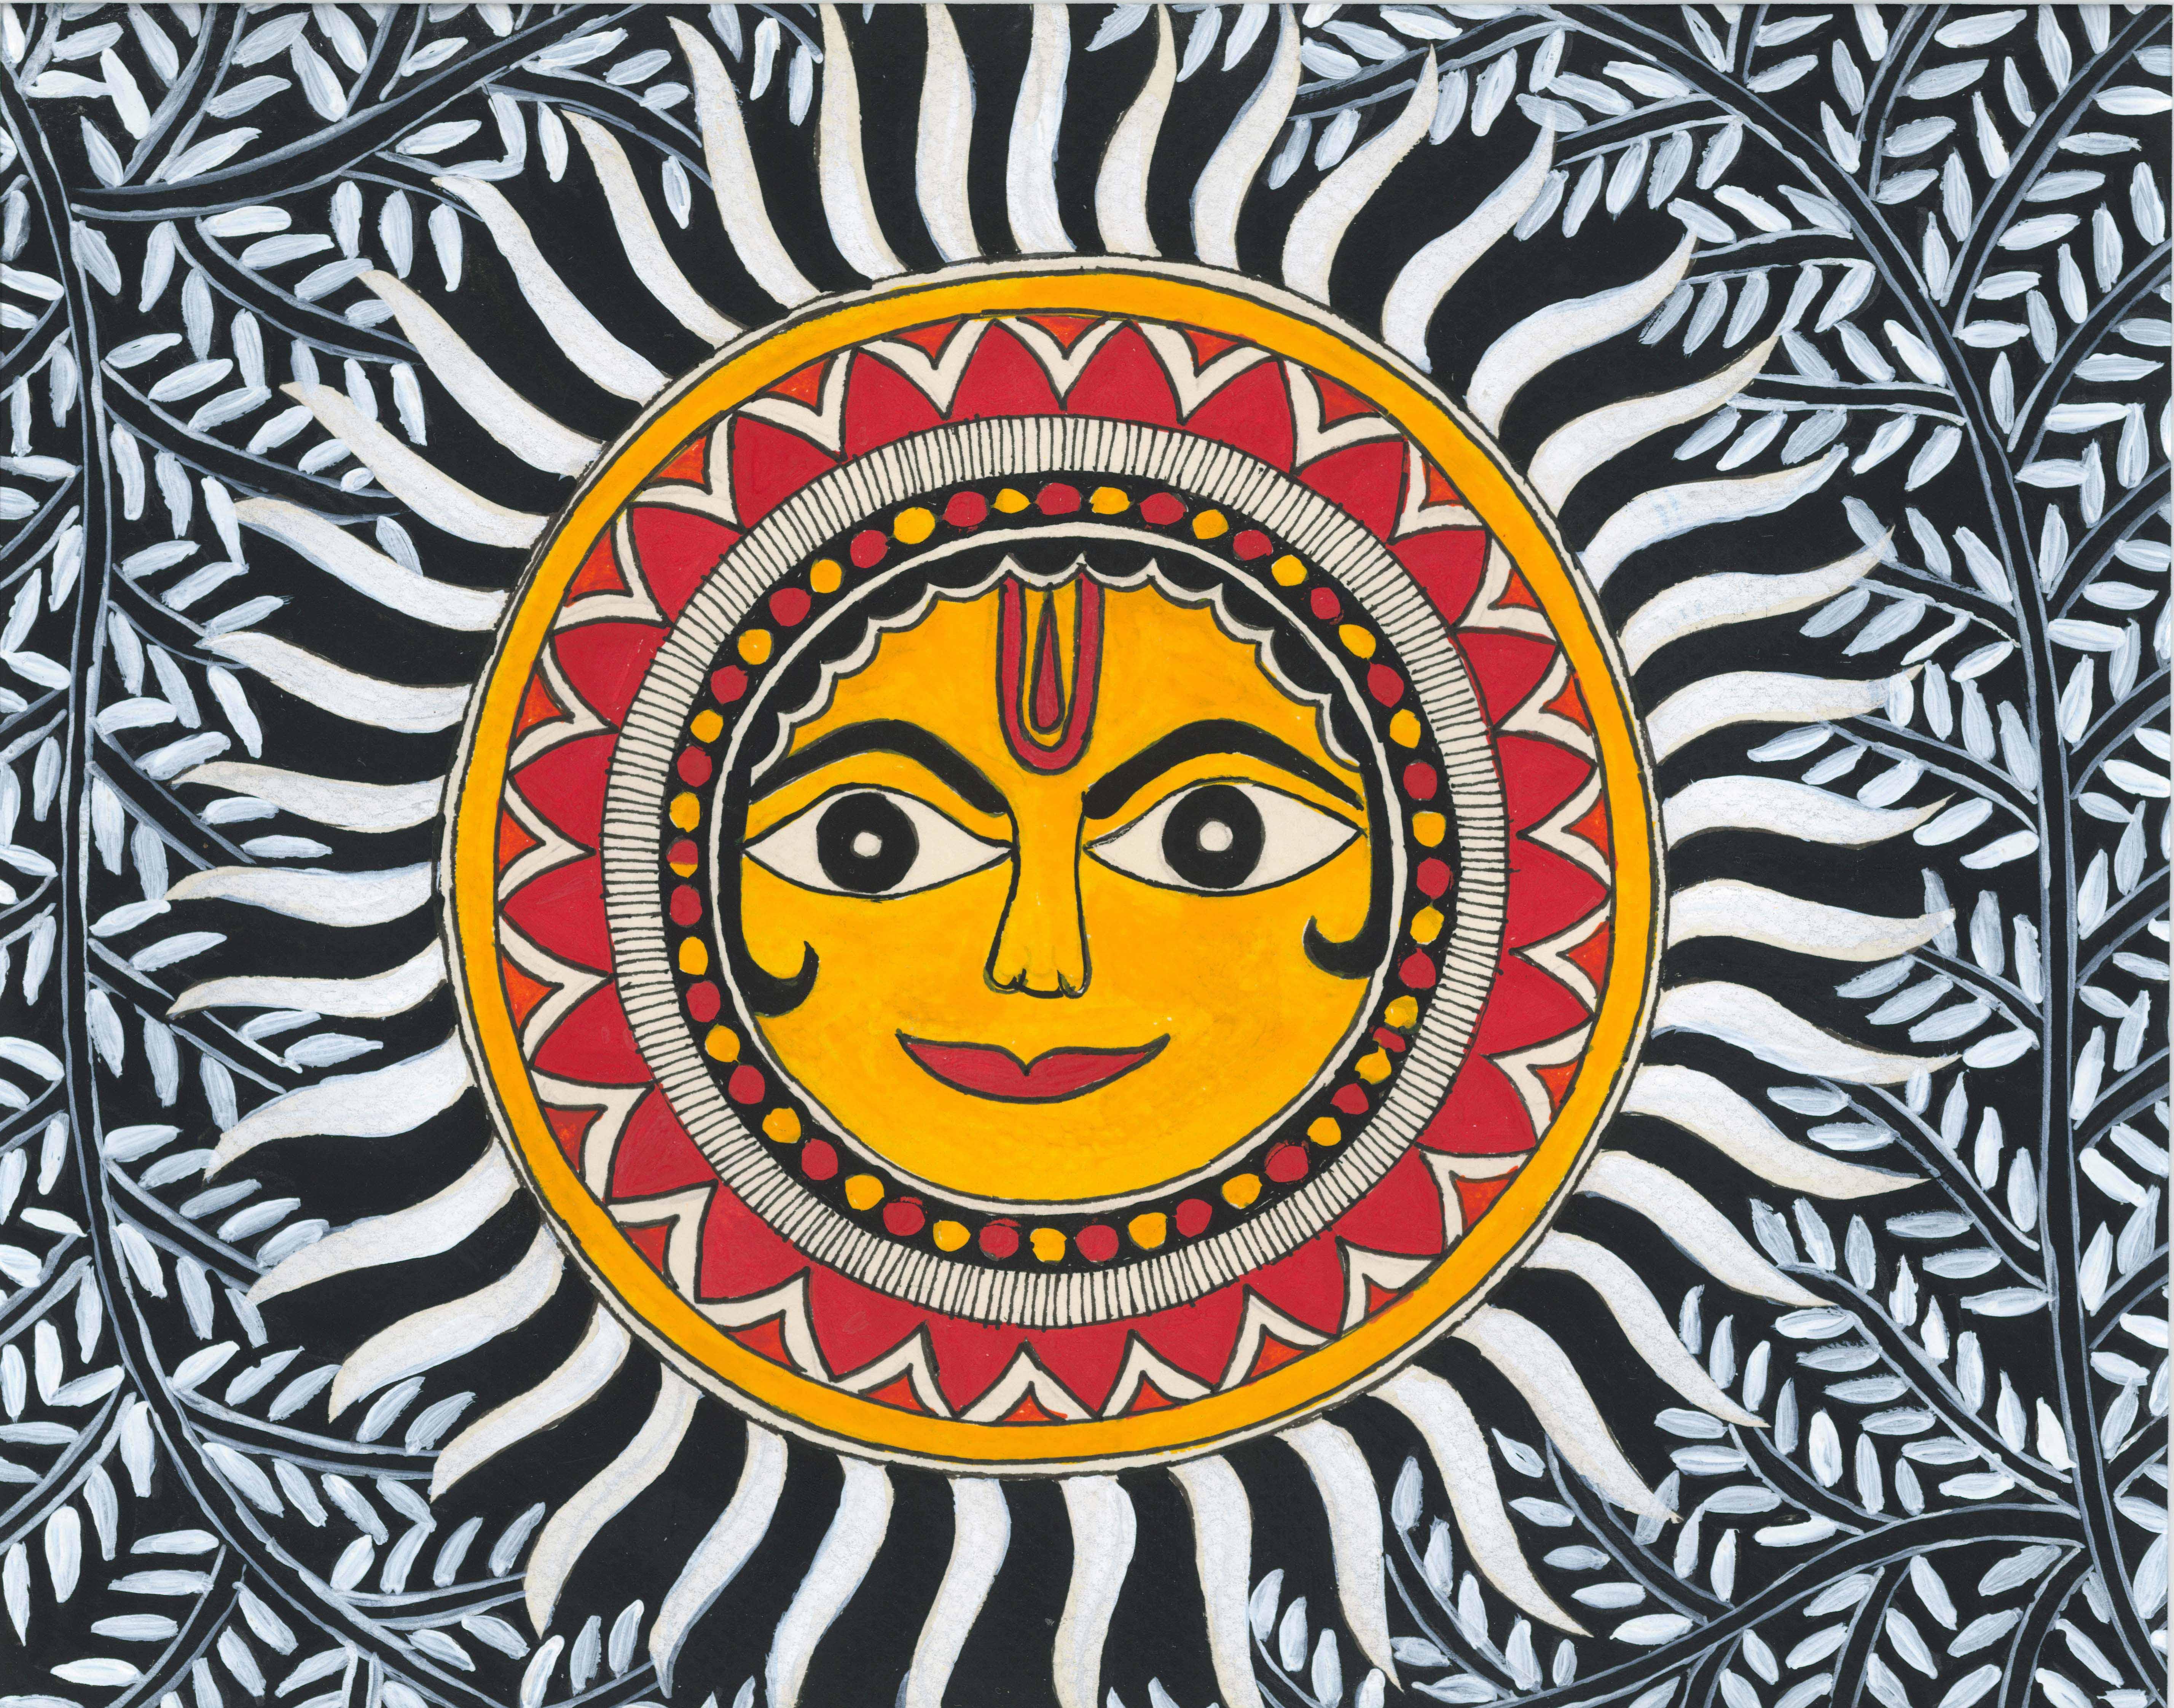 Tarangit Savitri kiran-wavy sun rays